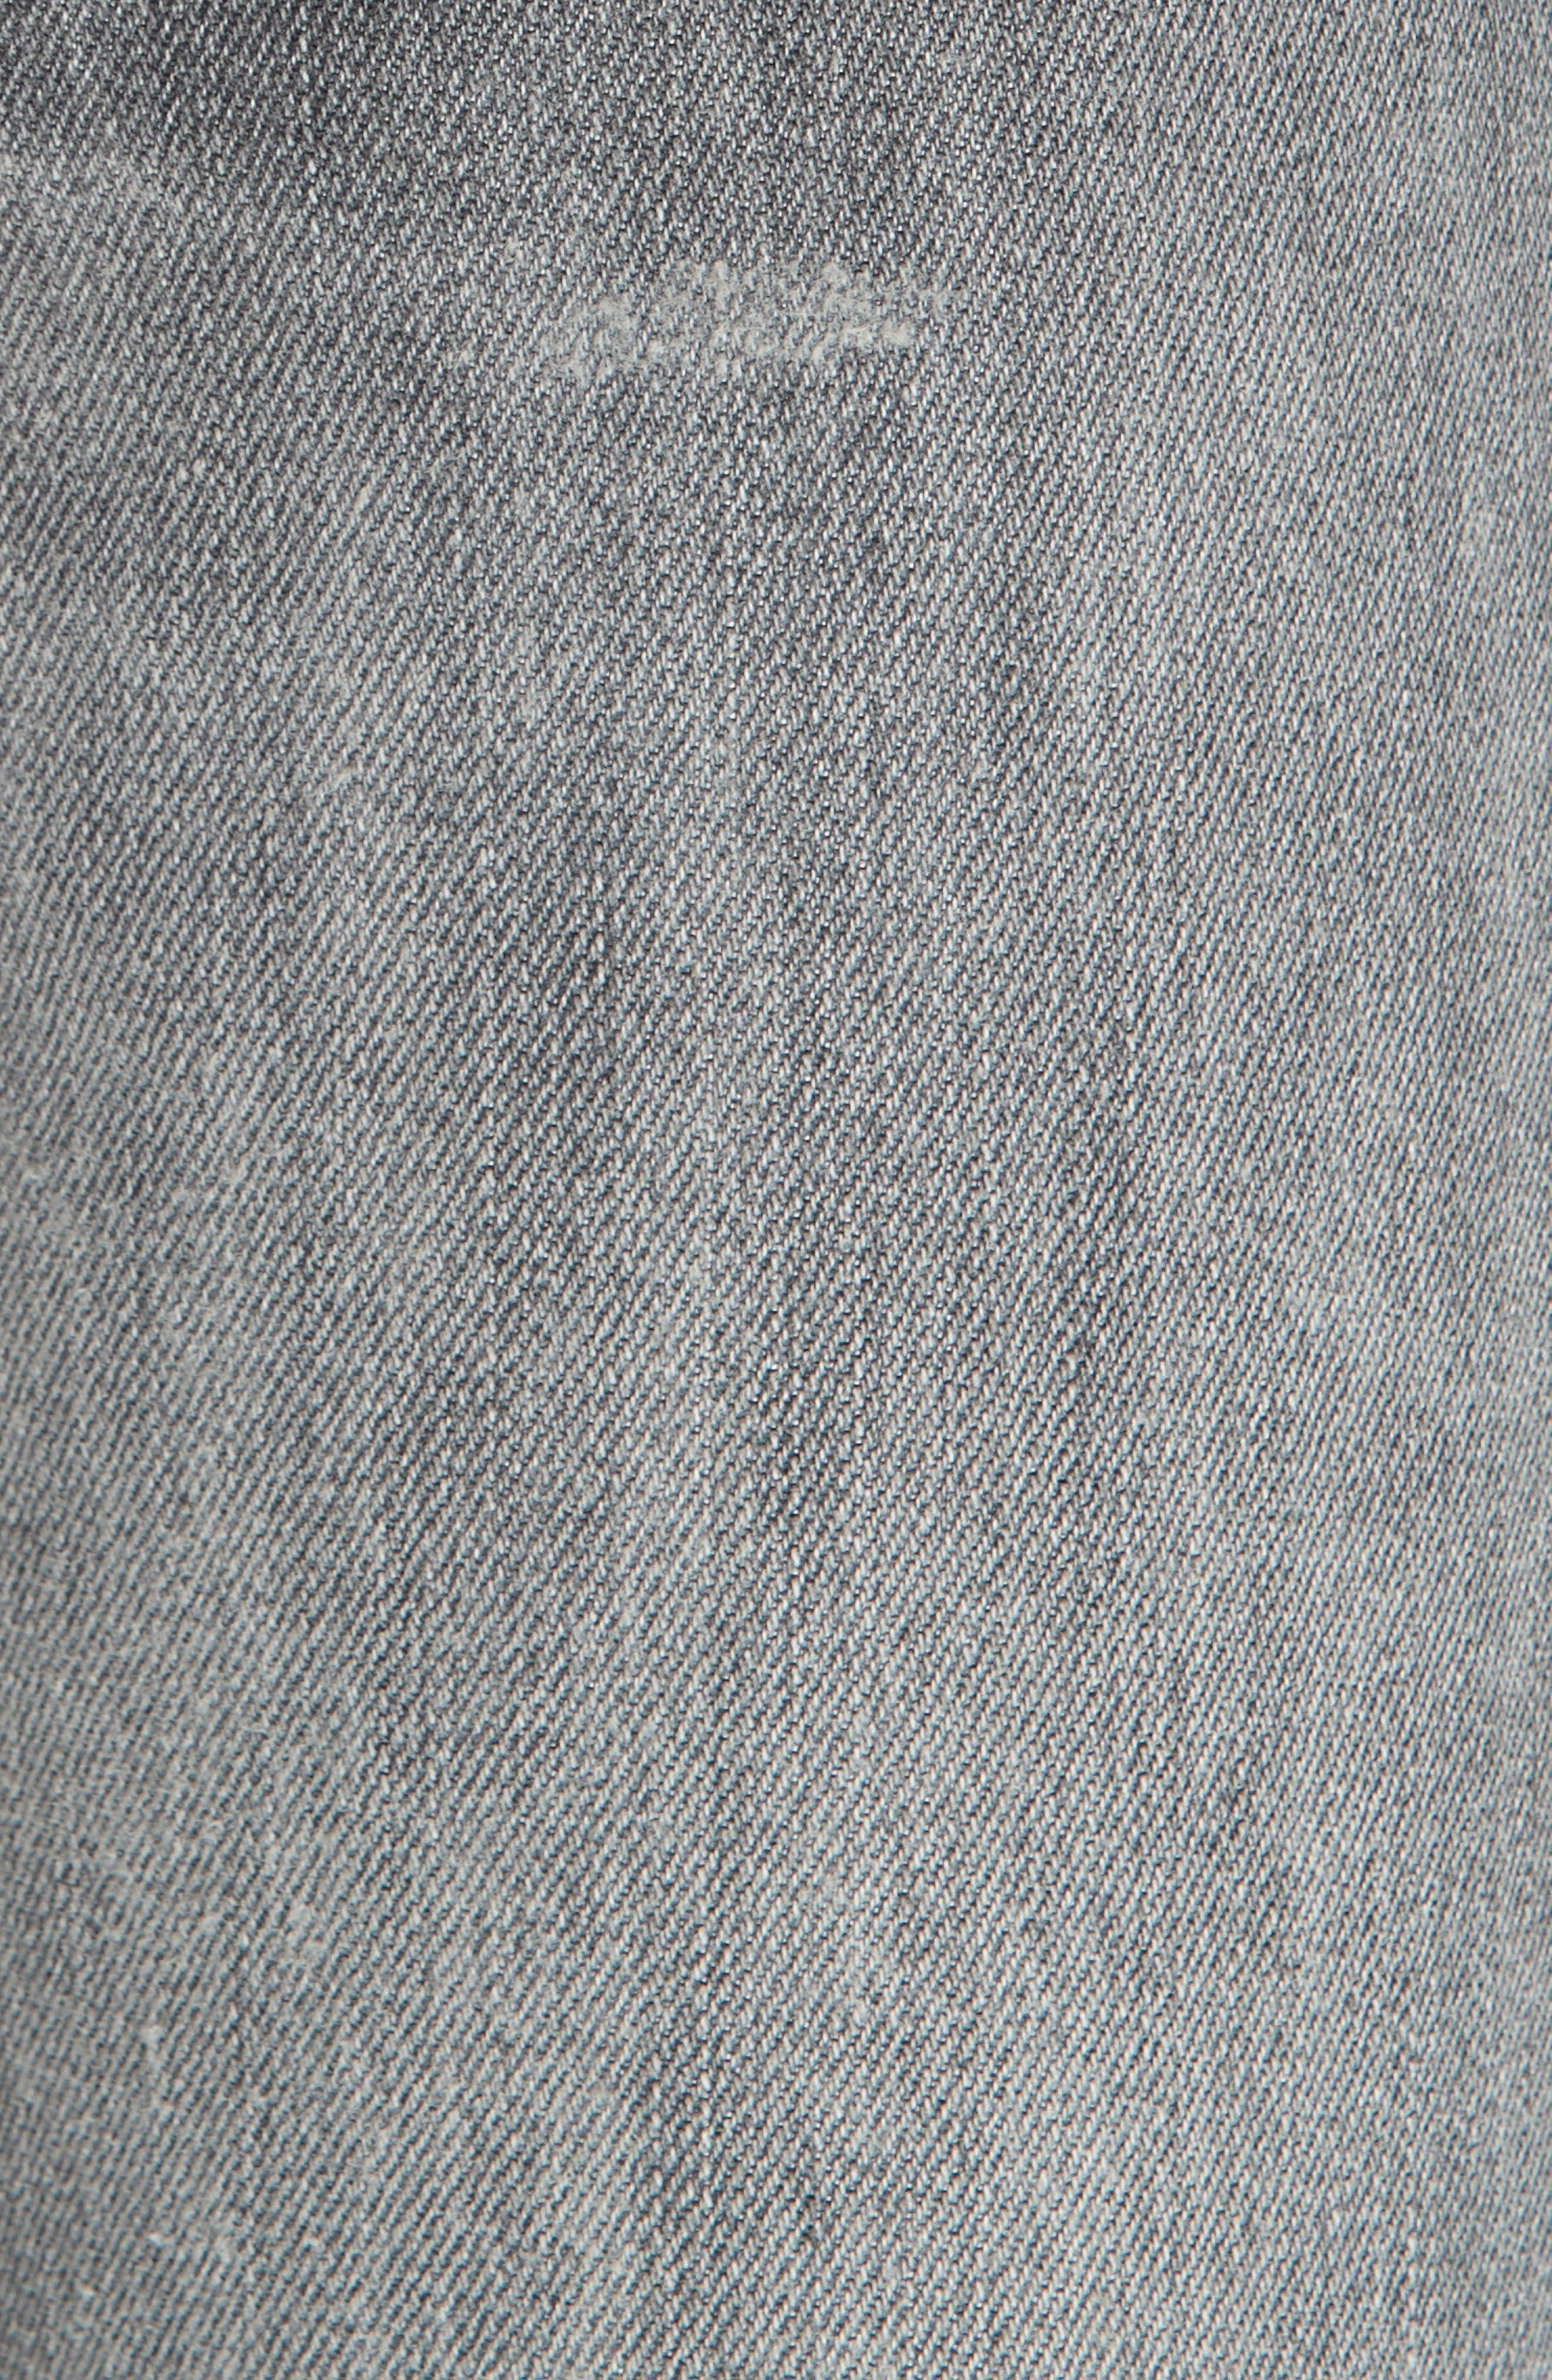 High Waist Slim Straight Crop Jeans,                             Alternate thumbnail 5, color,                             020